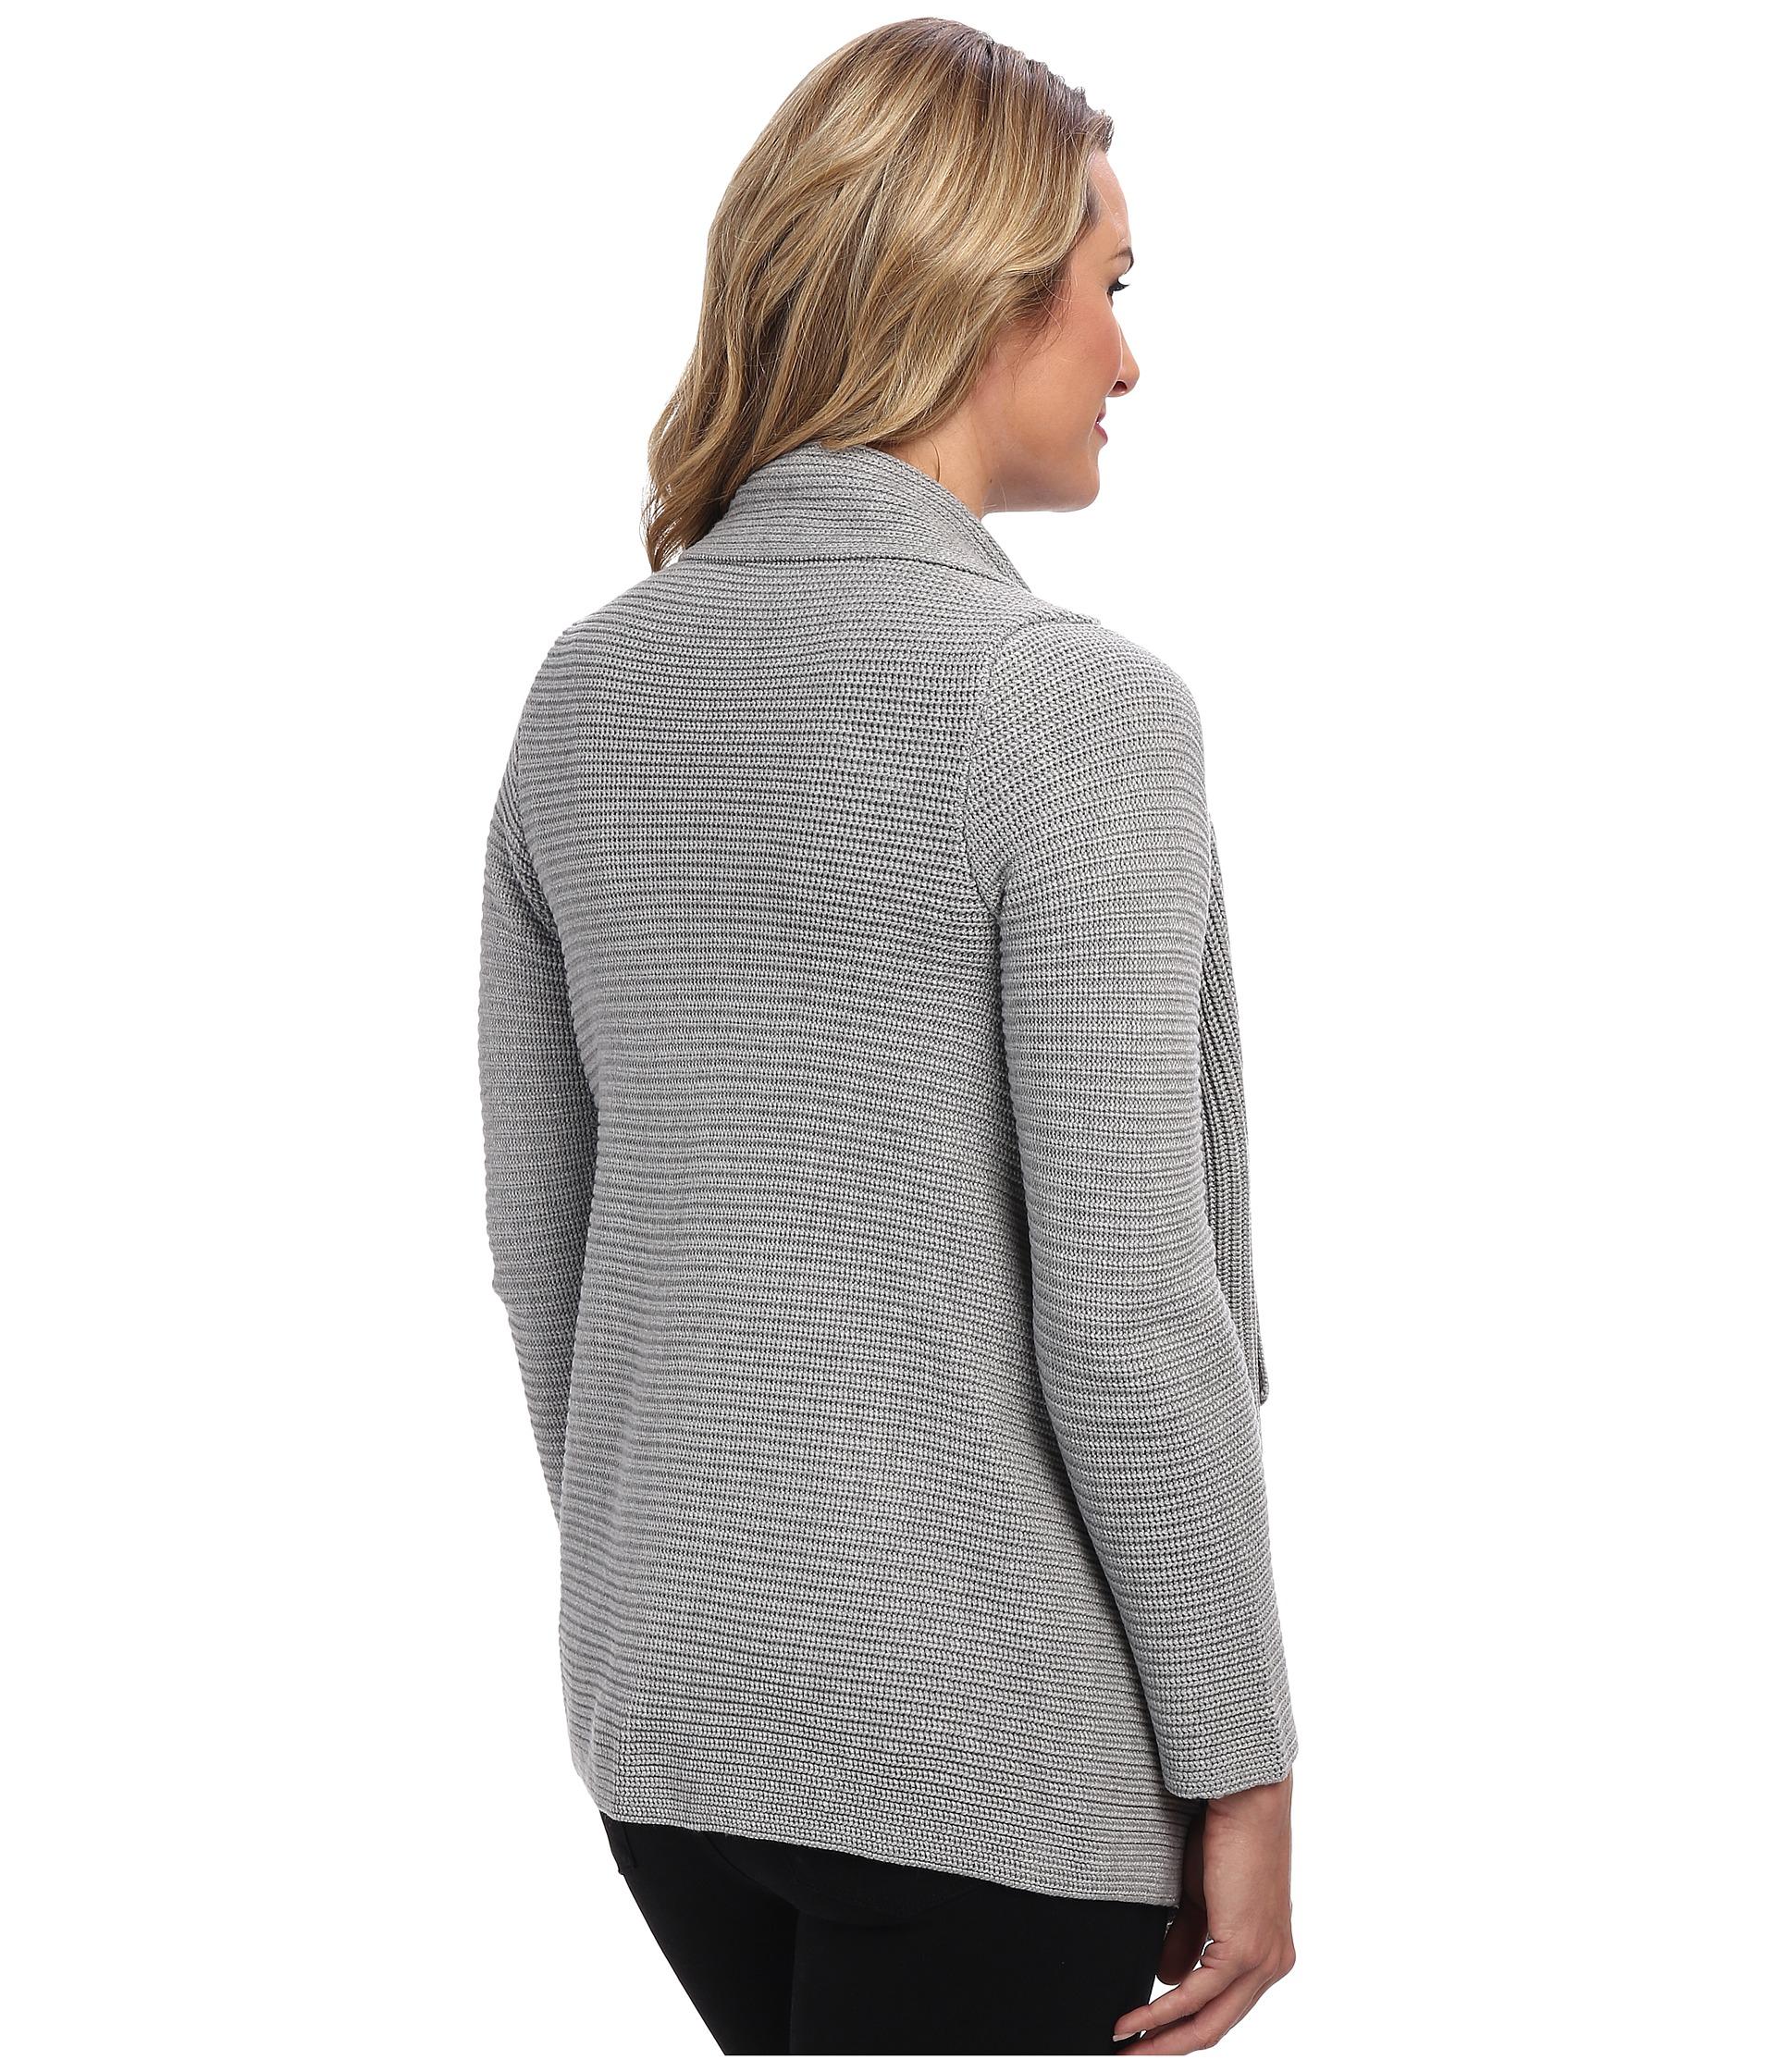 calvin klein ribbed sweater jacket ladies sweater patterns. Black Bedroom Furniture Sets. Home Design Ideas